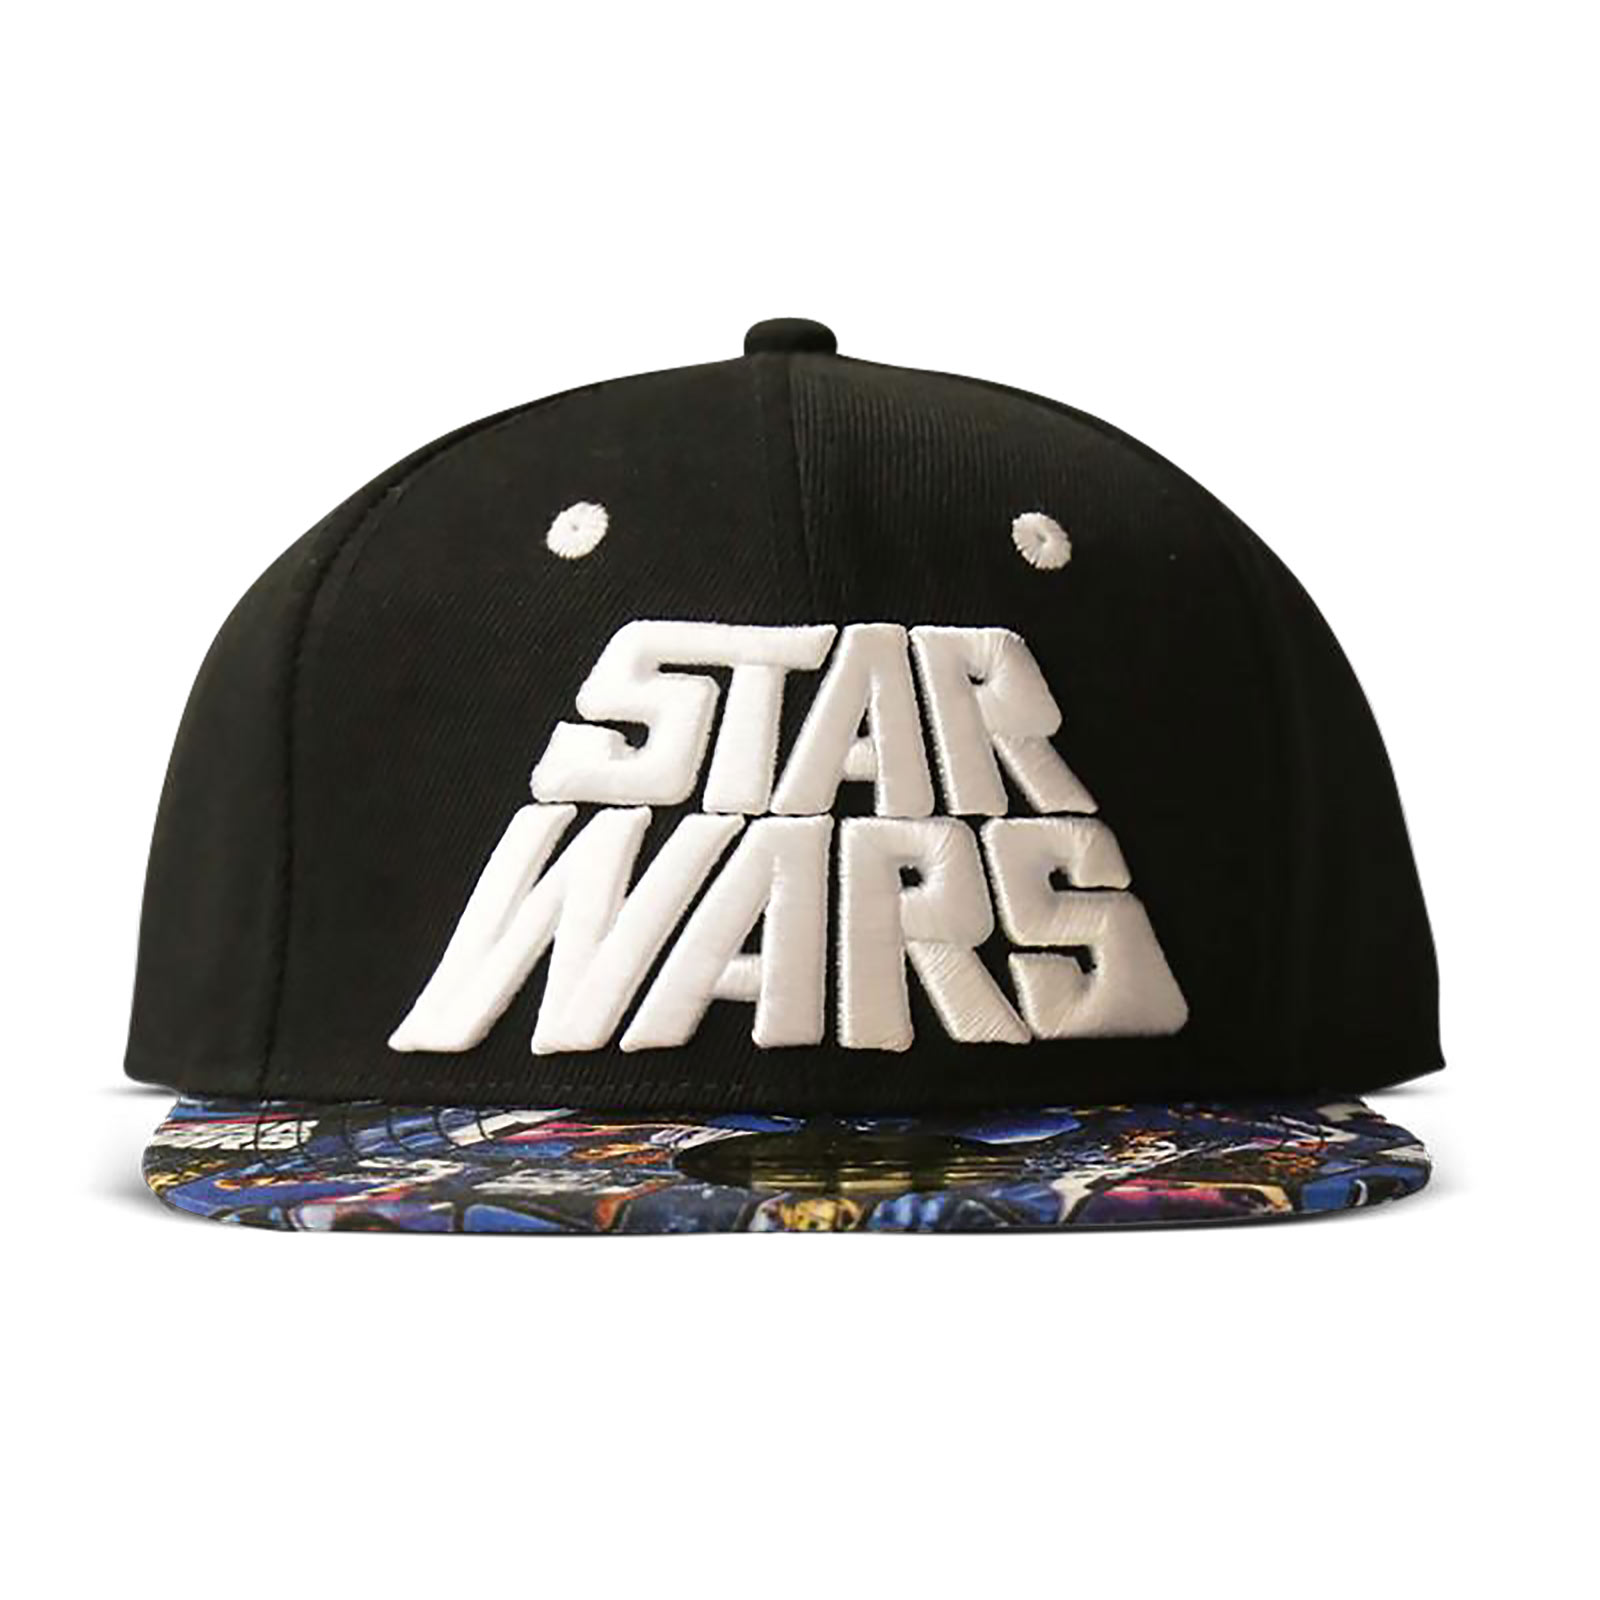 Star Wars - A New Hope Snapback Cap